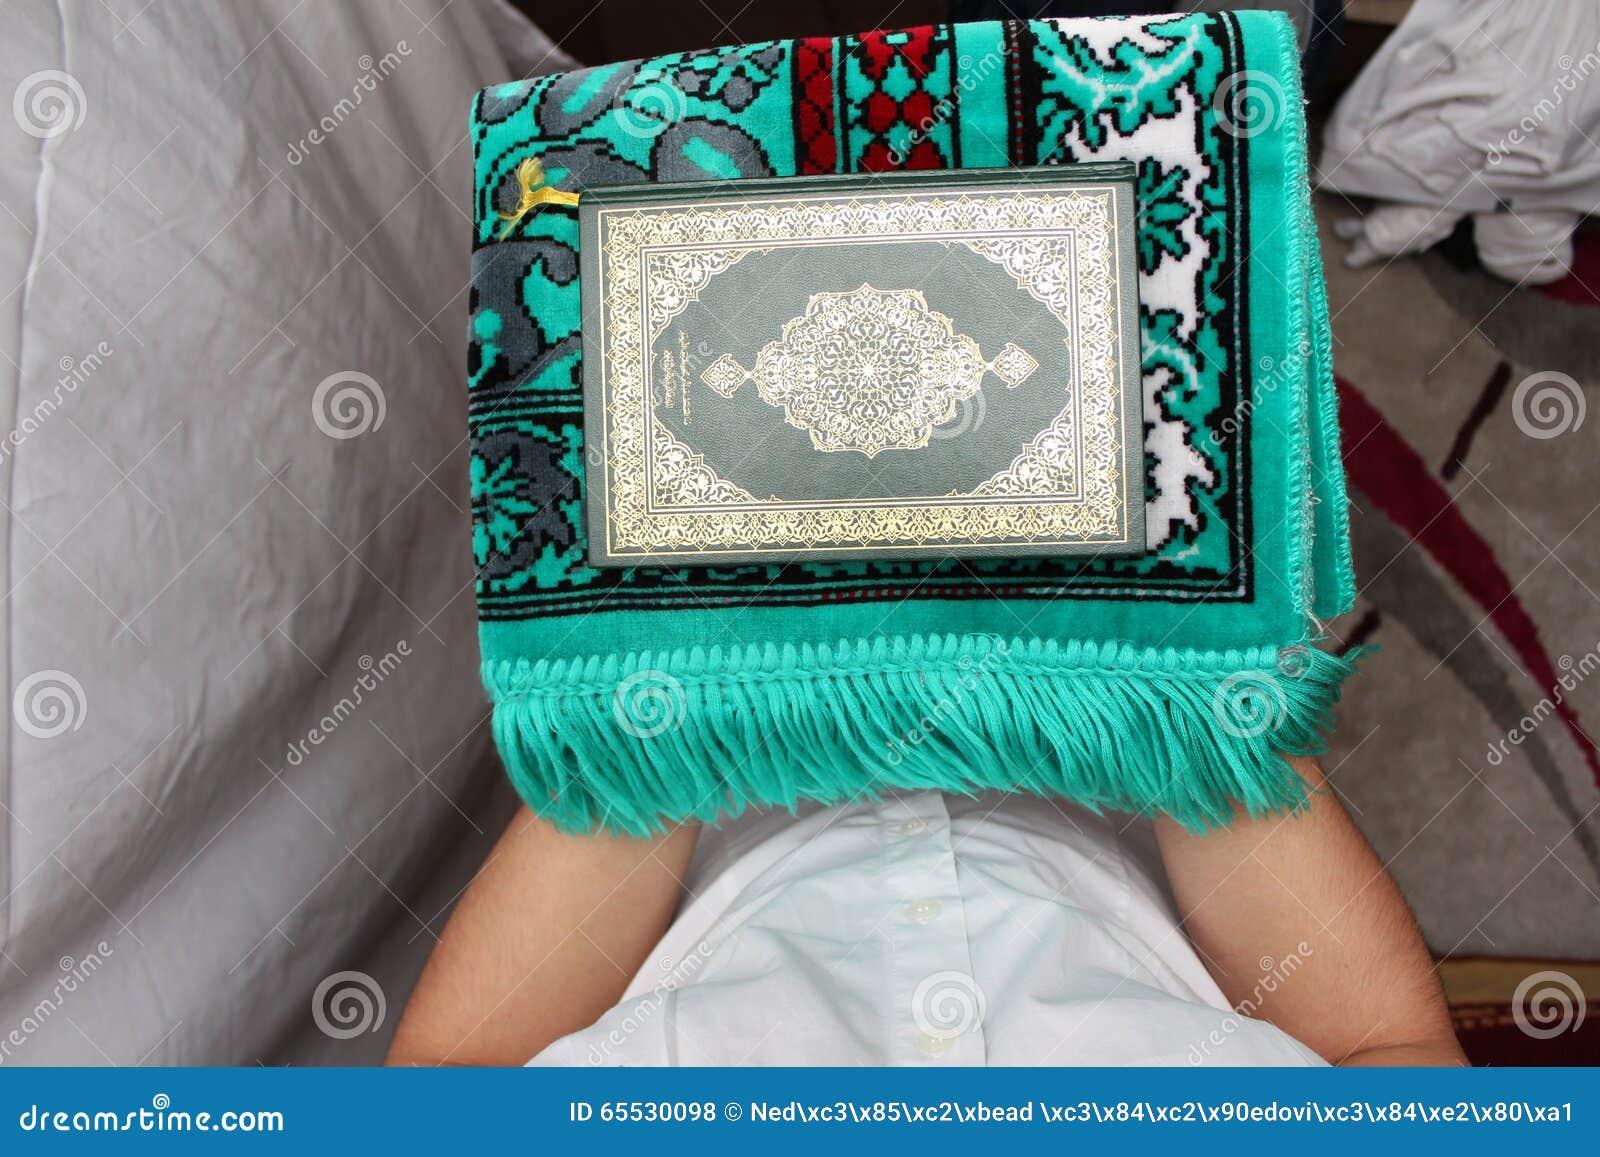 Muslim men Reading Holy Islamic Book Koran